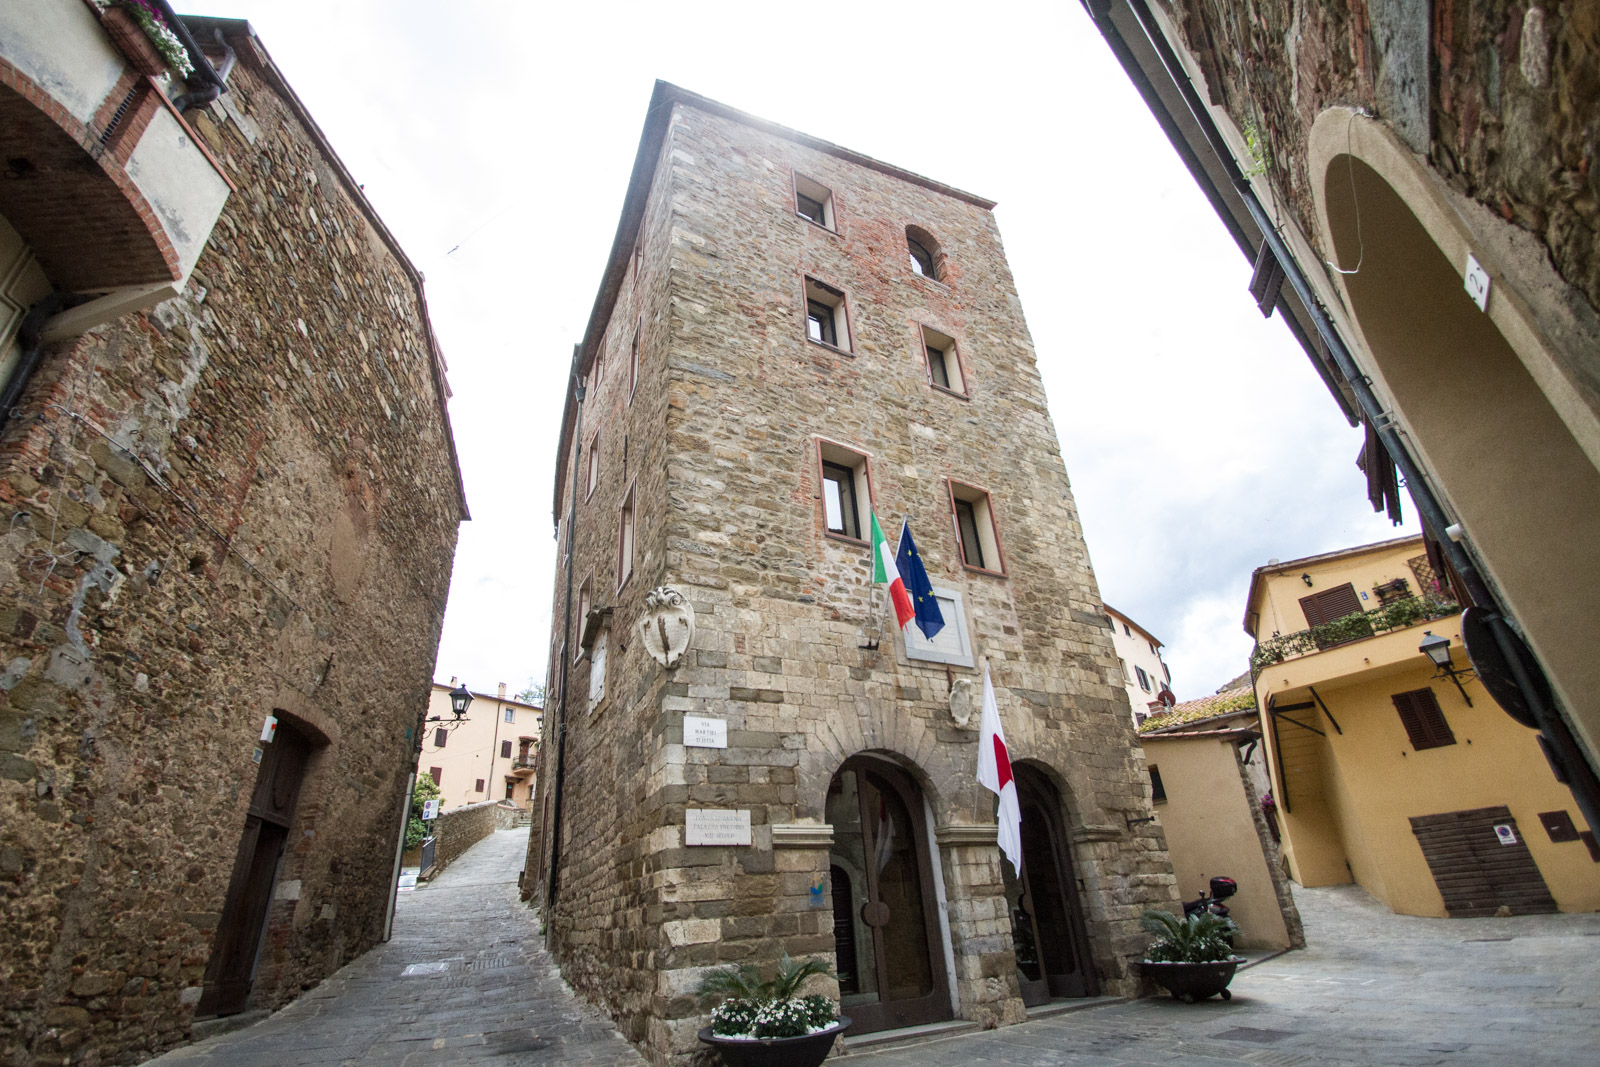 The commune of Scarlino.